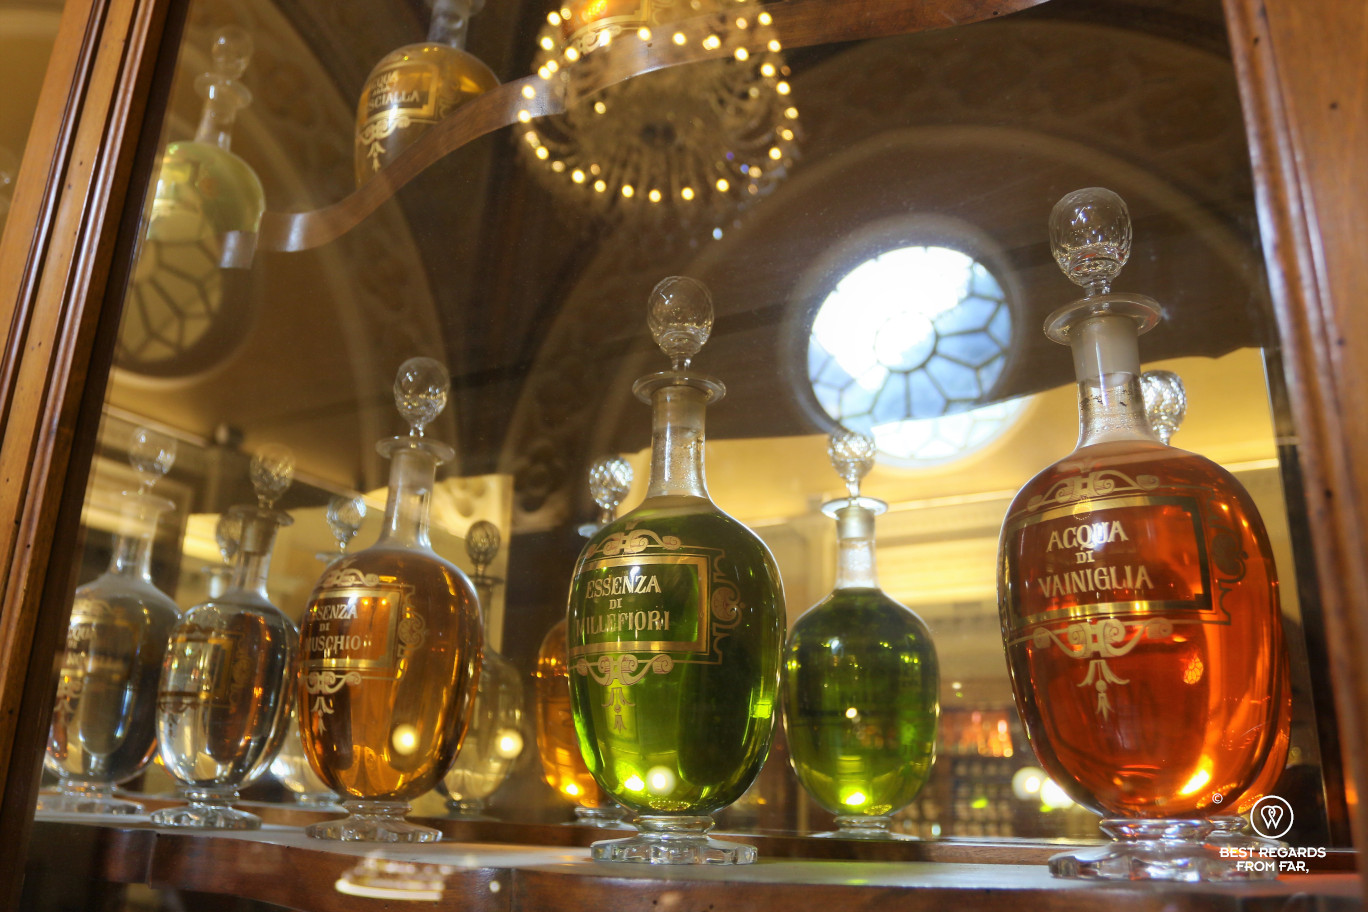 The crafts of Florence: perfumes at the Officina Profumo Farmaceutica di Santa Maria Novella.